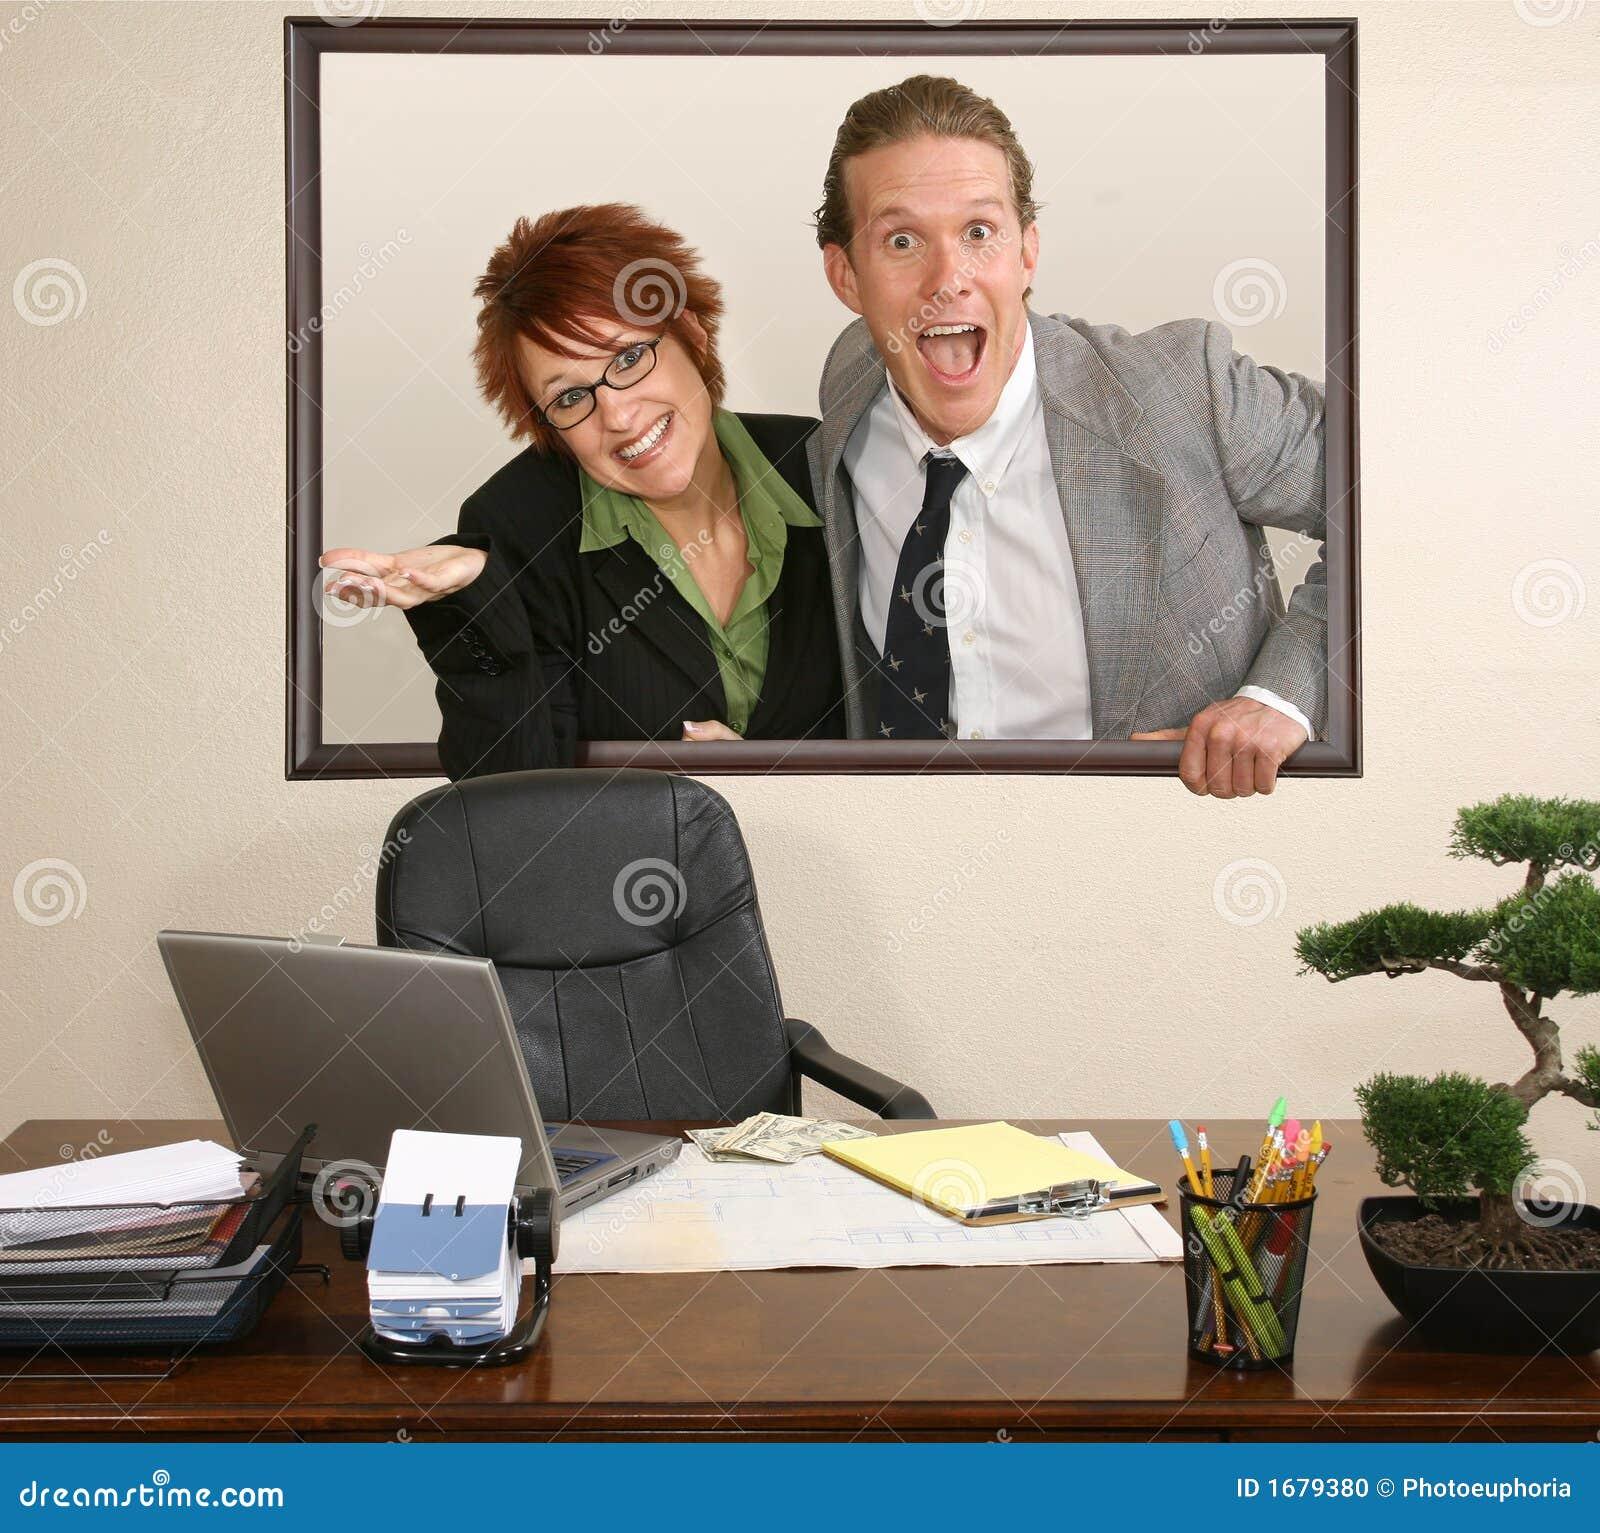 Office portrait stock photo image 1679380 - Office portrait photography ...